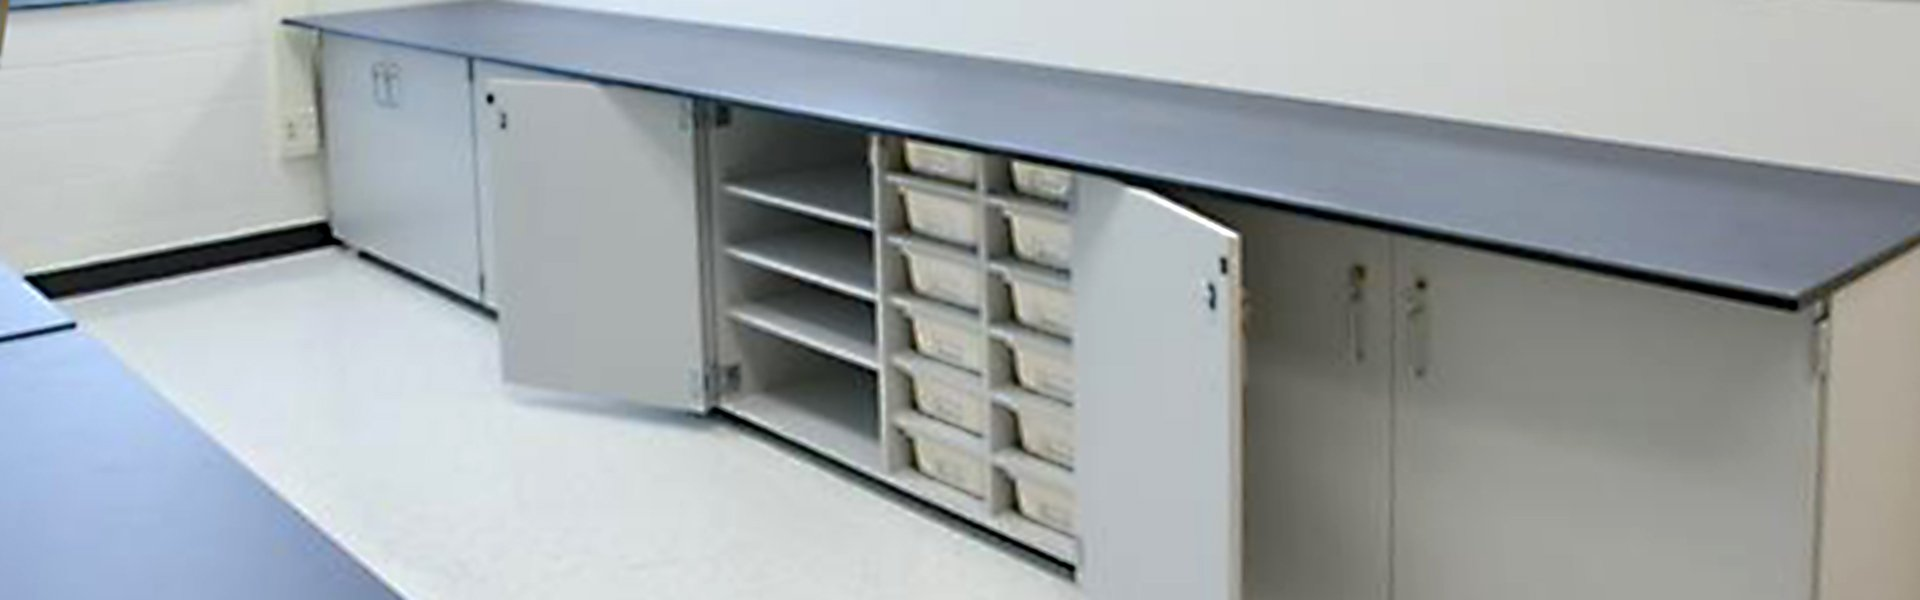 Corilam Casegoods Shop Cabinets B